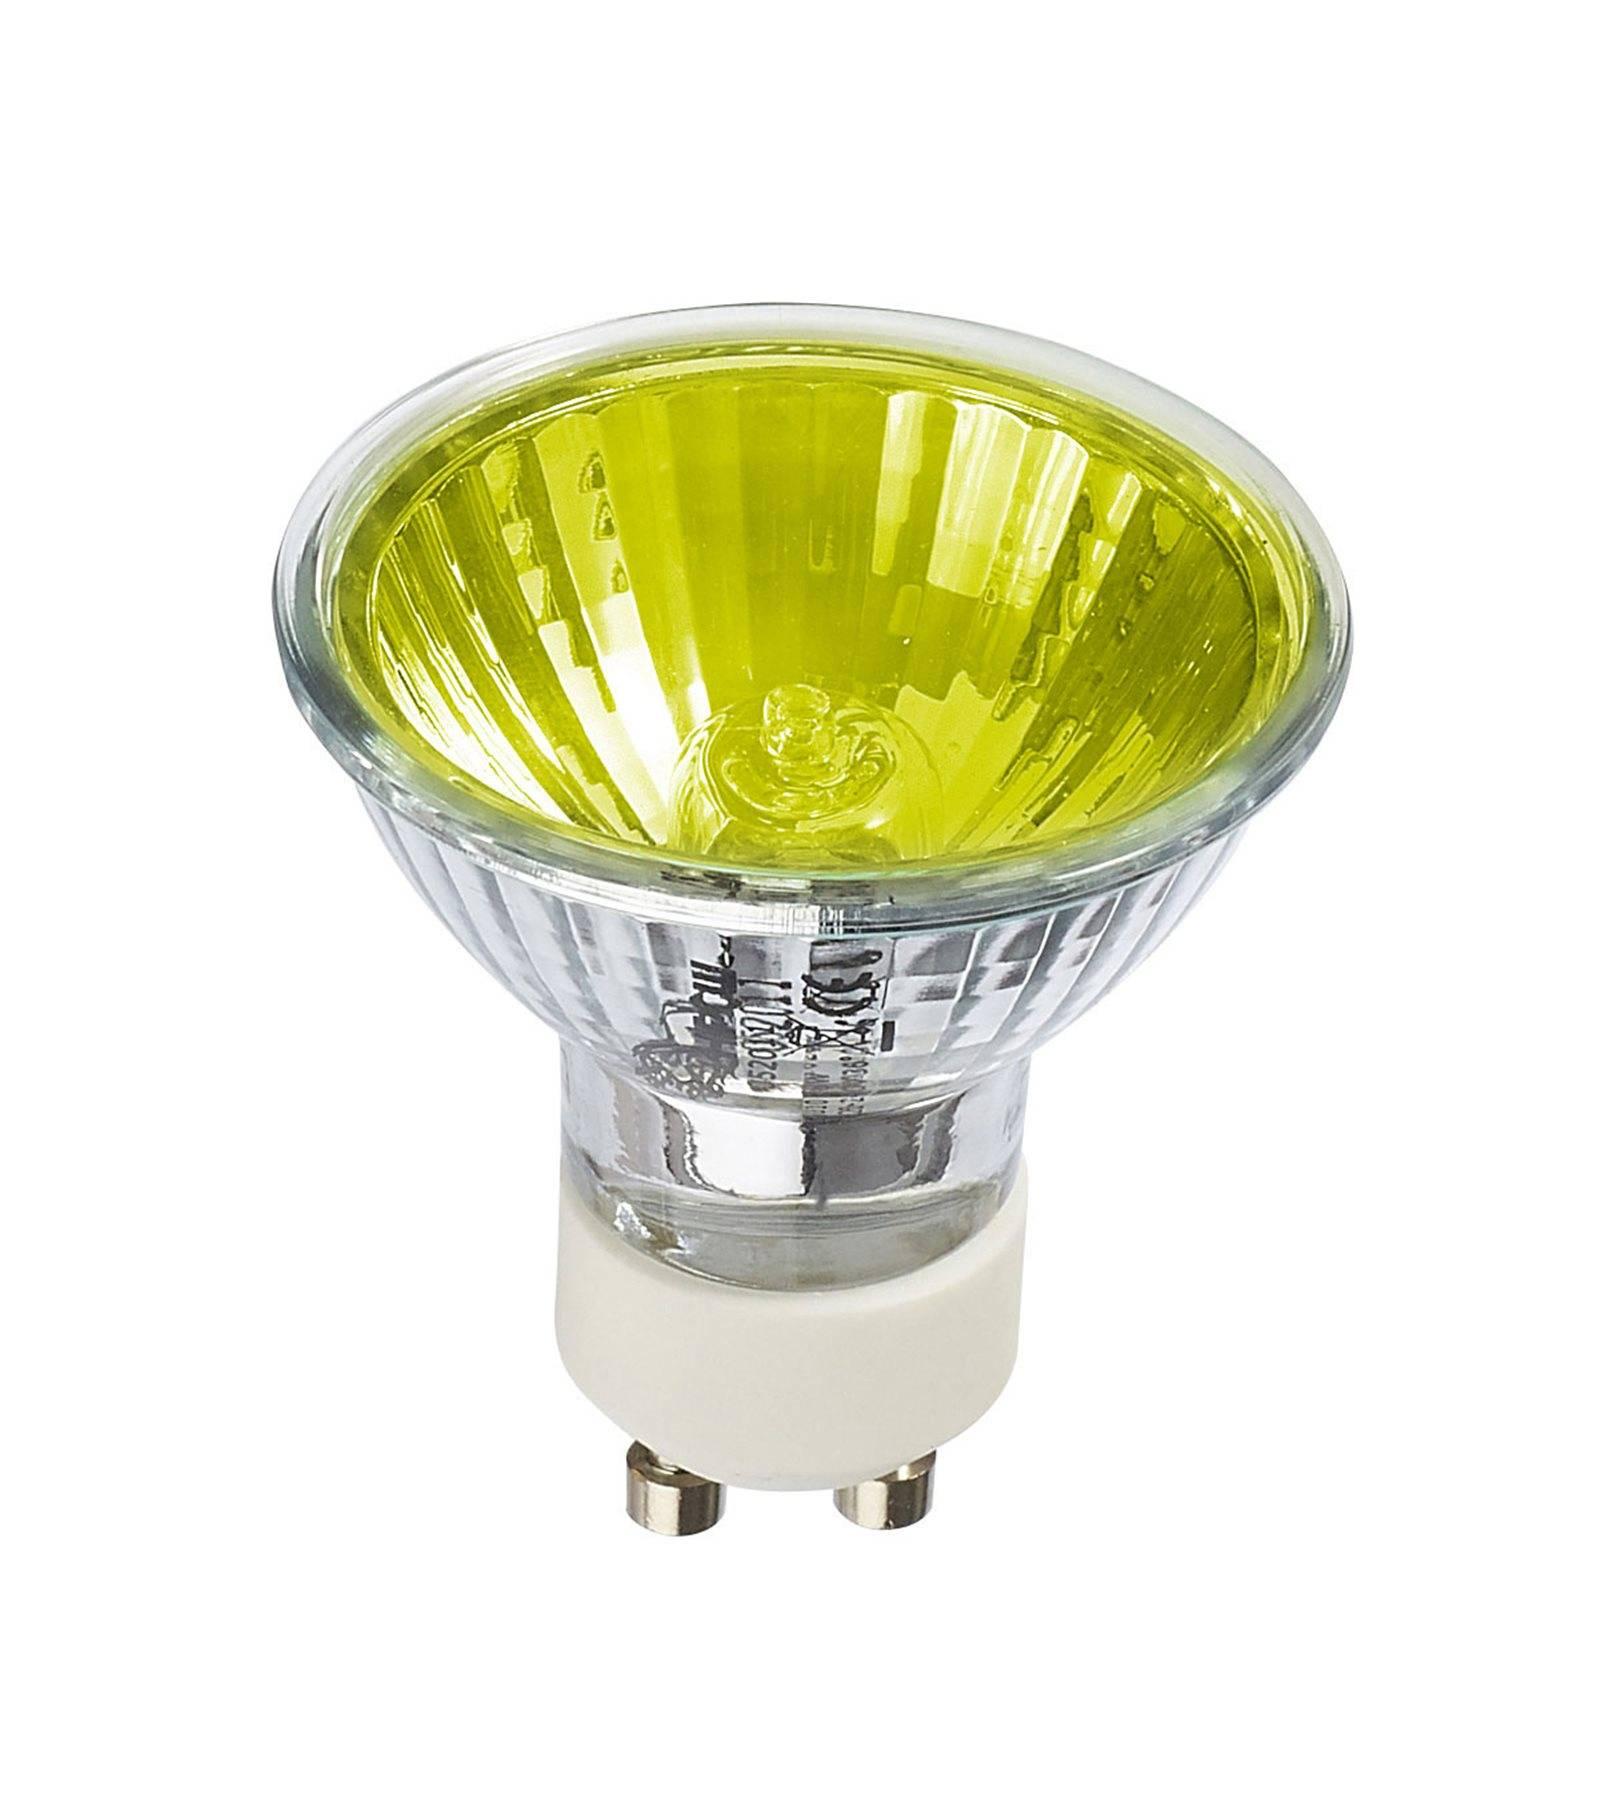 ampoule eco halog ne gu10 28w quiv 35w jaune 36 hipow ampoule eco halogene siageo. Black Bedroom Furniture Sets. Home Design Ideas